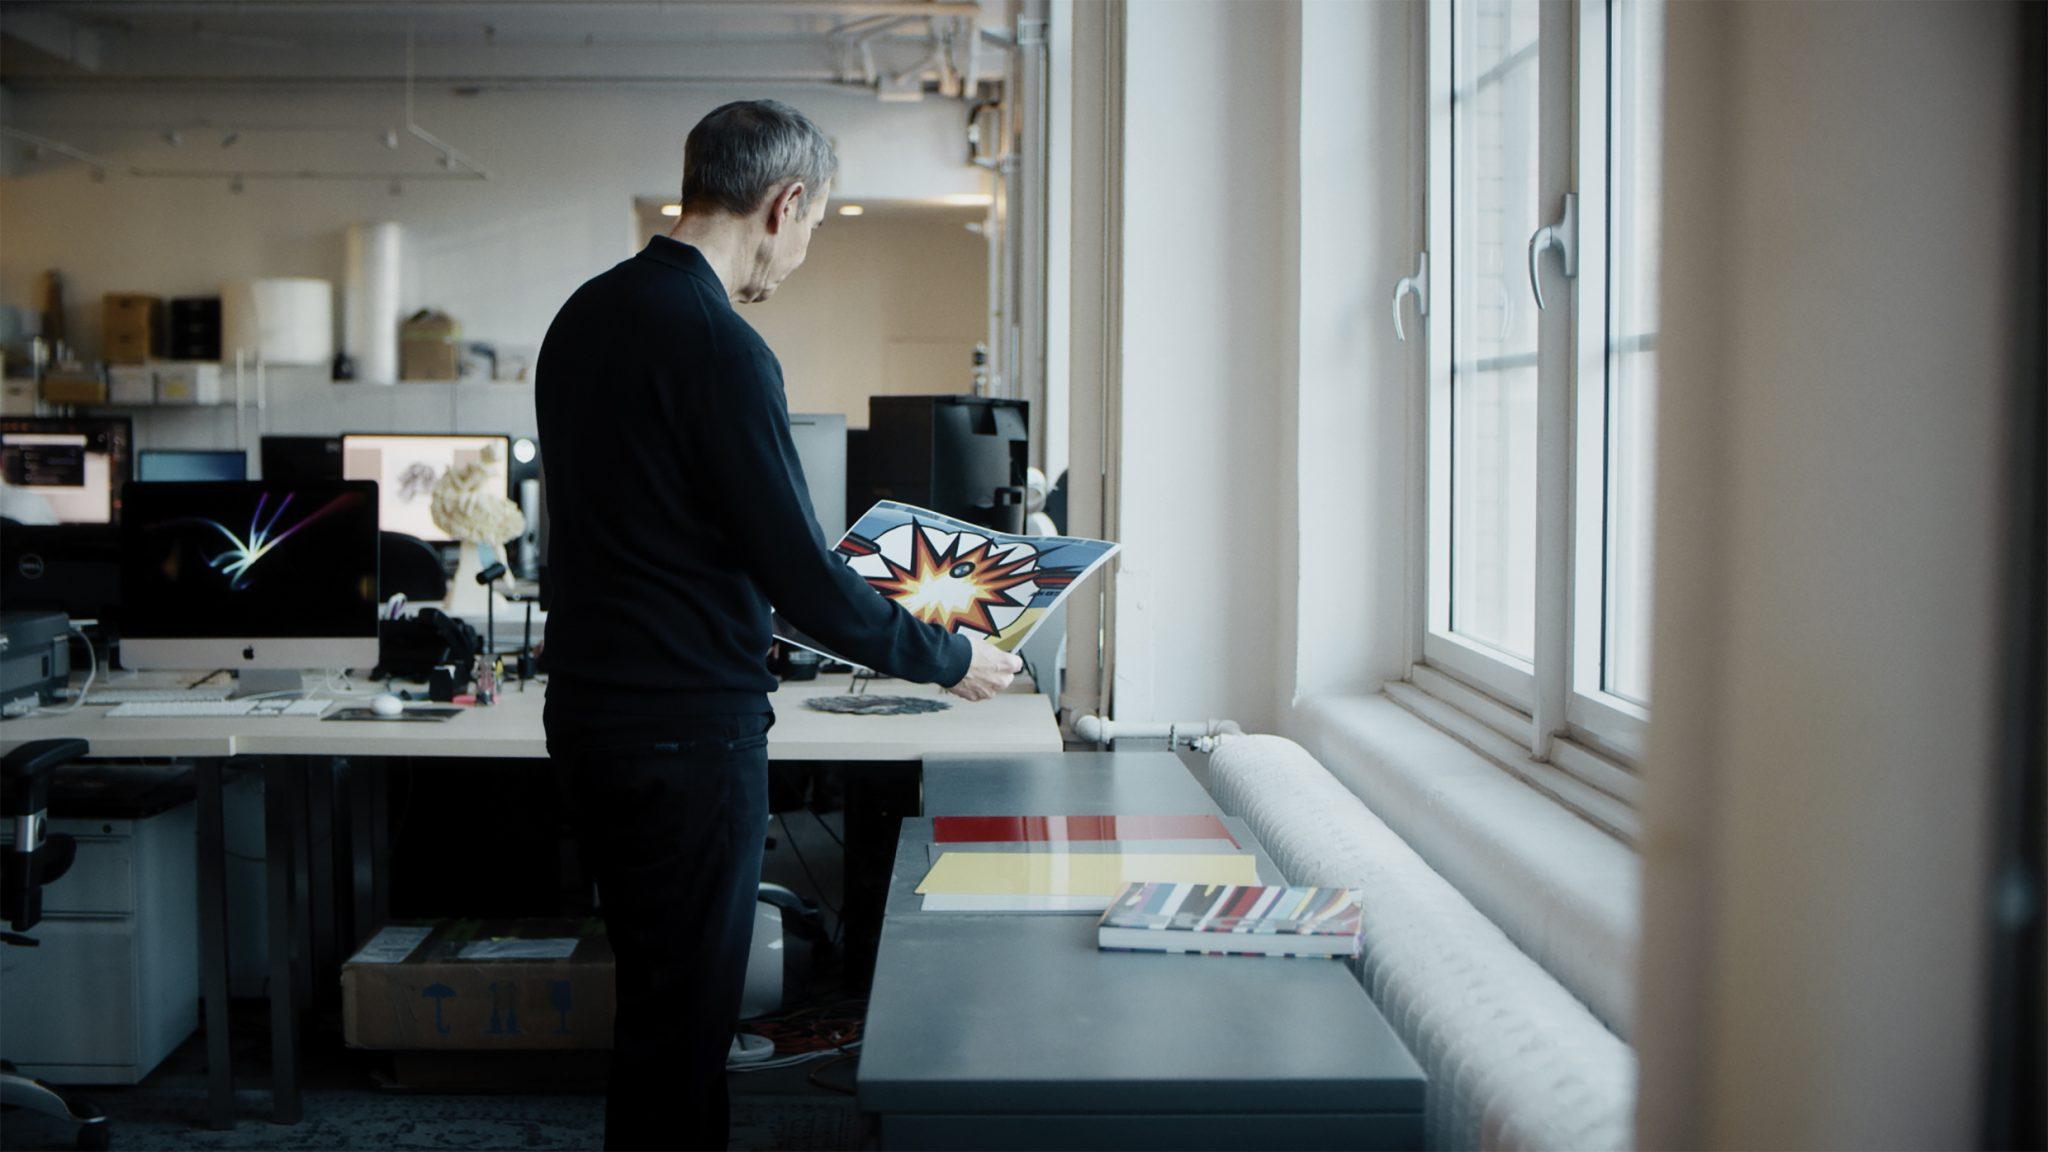 Image of Jeff Koons in his studio